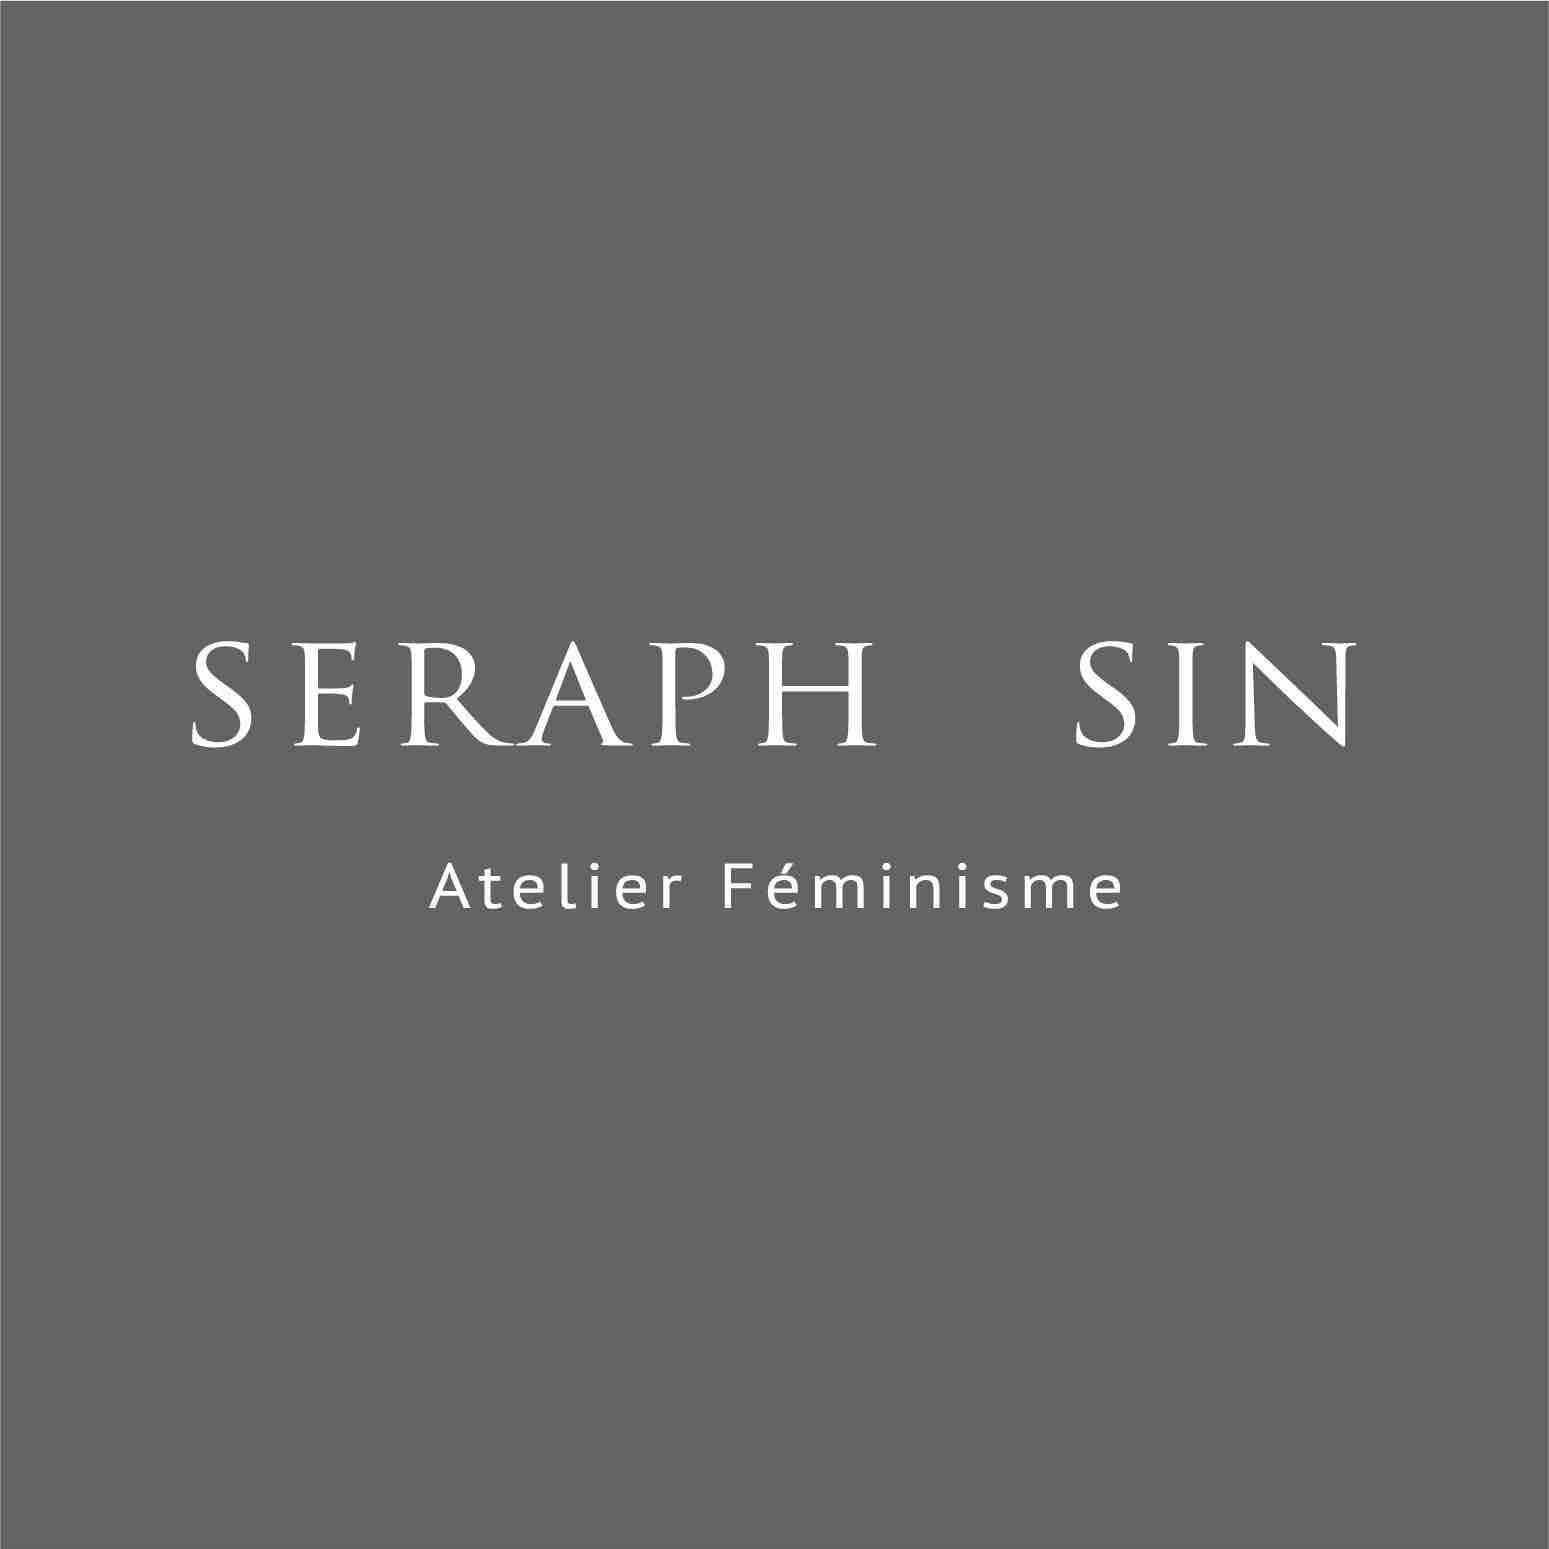 SERAPH_SIN